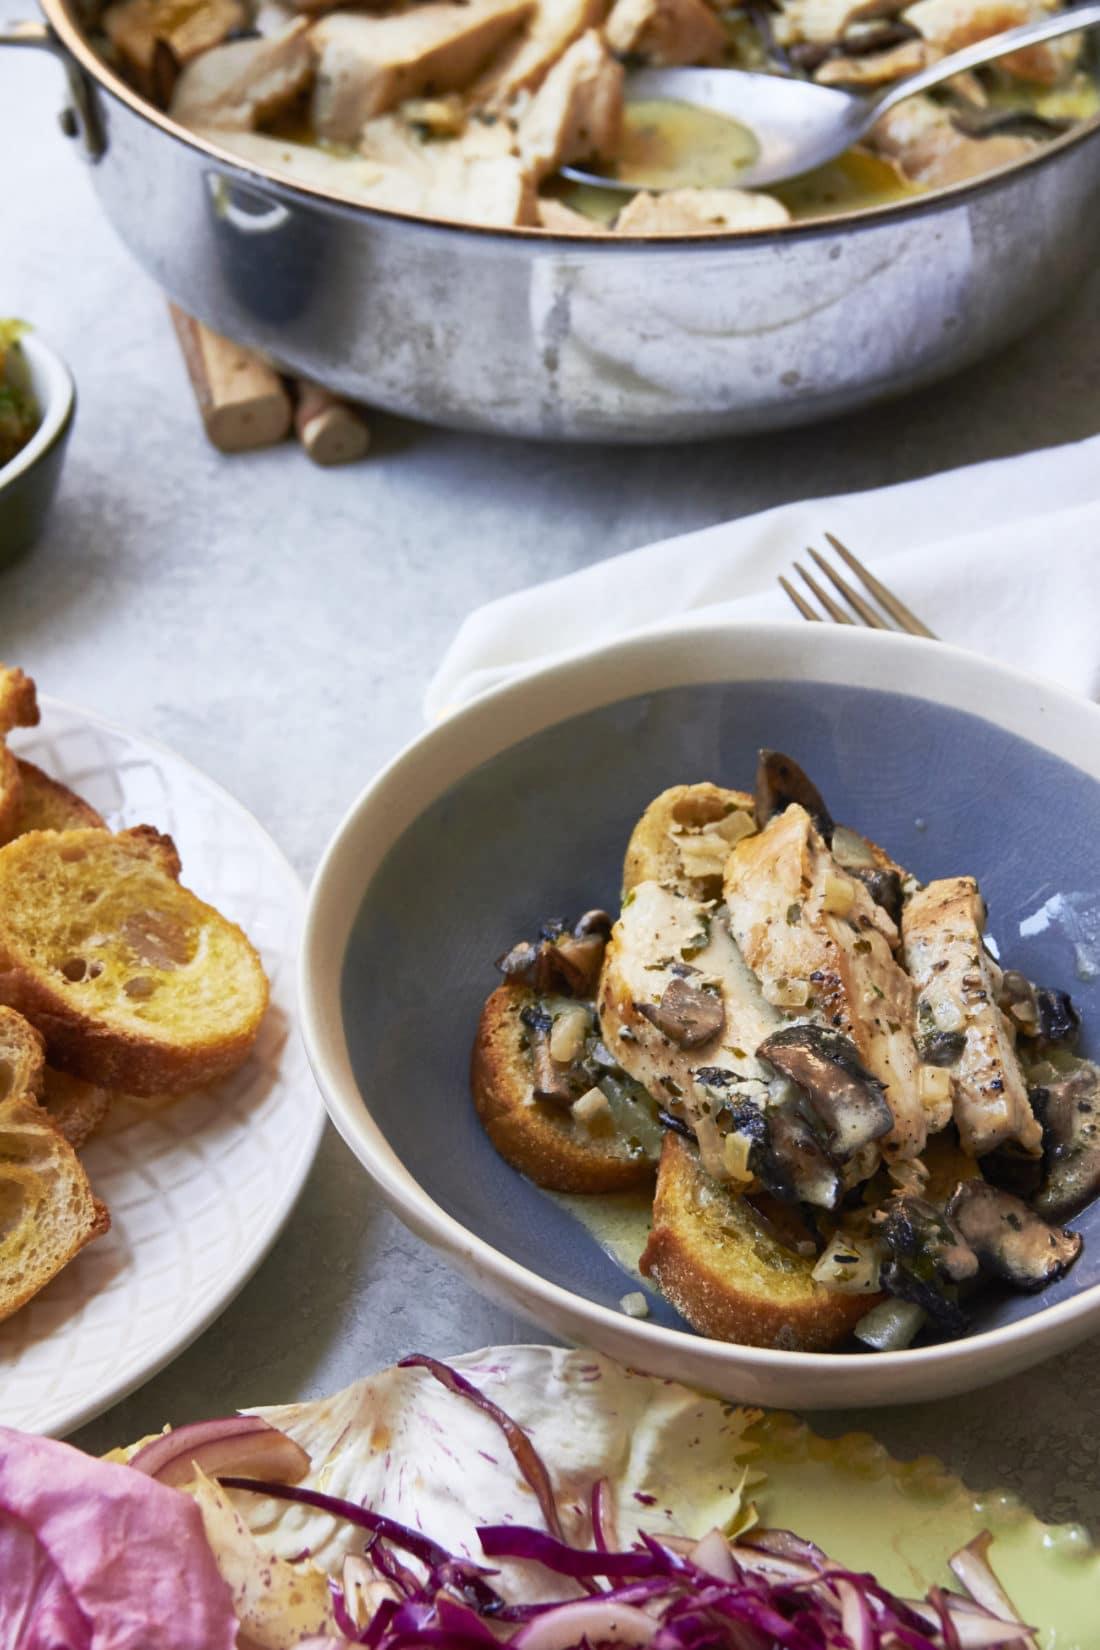 Chicken with Mushrooms in Cream Sauce